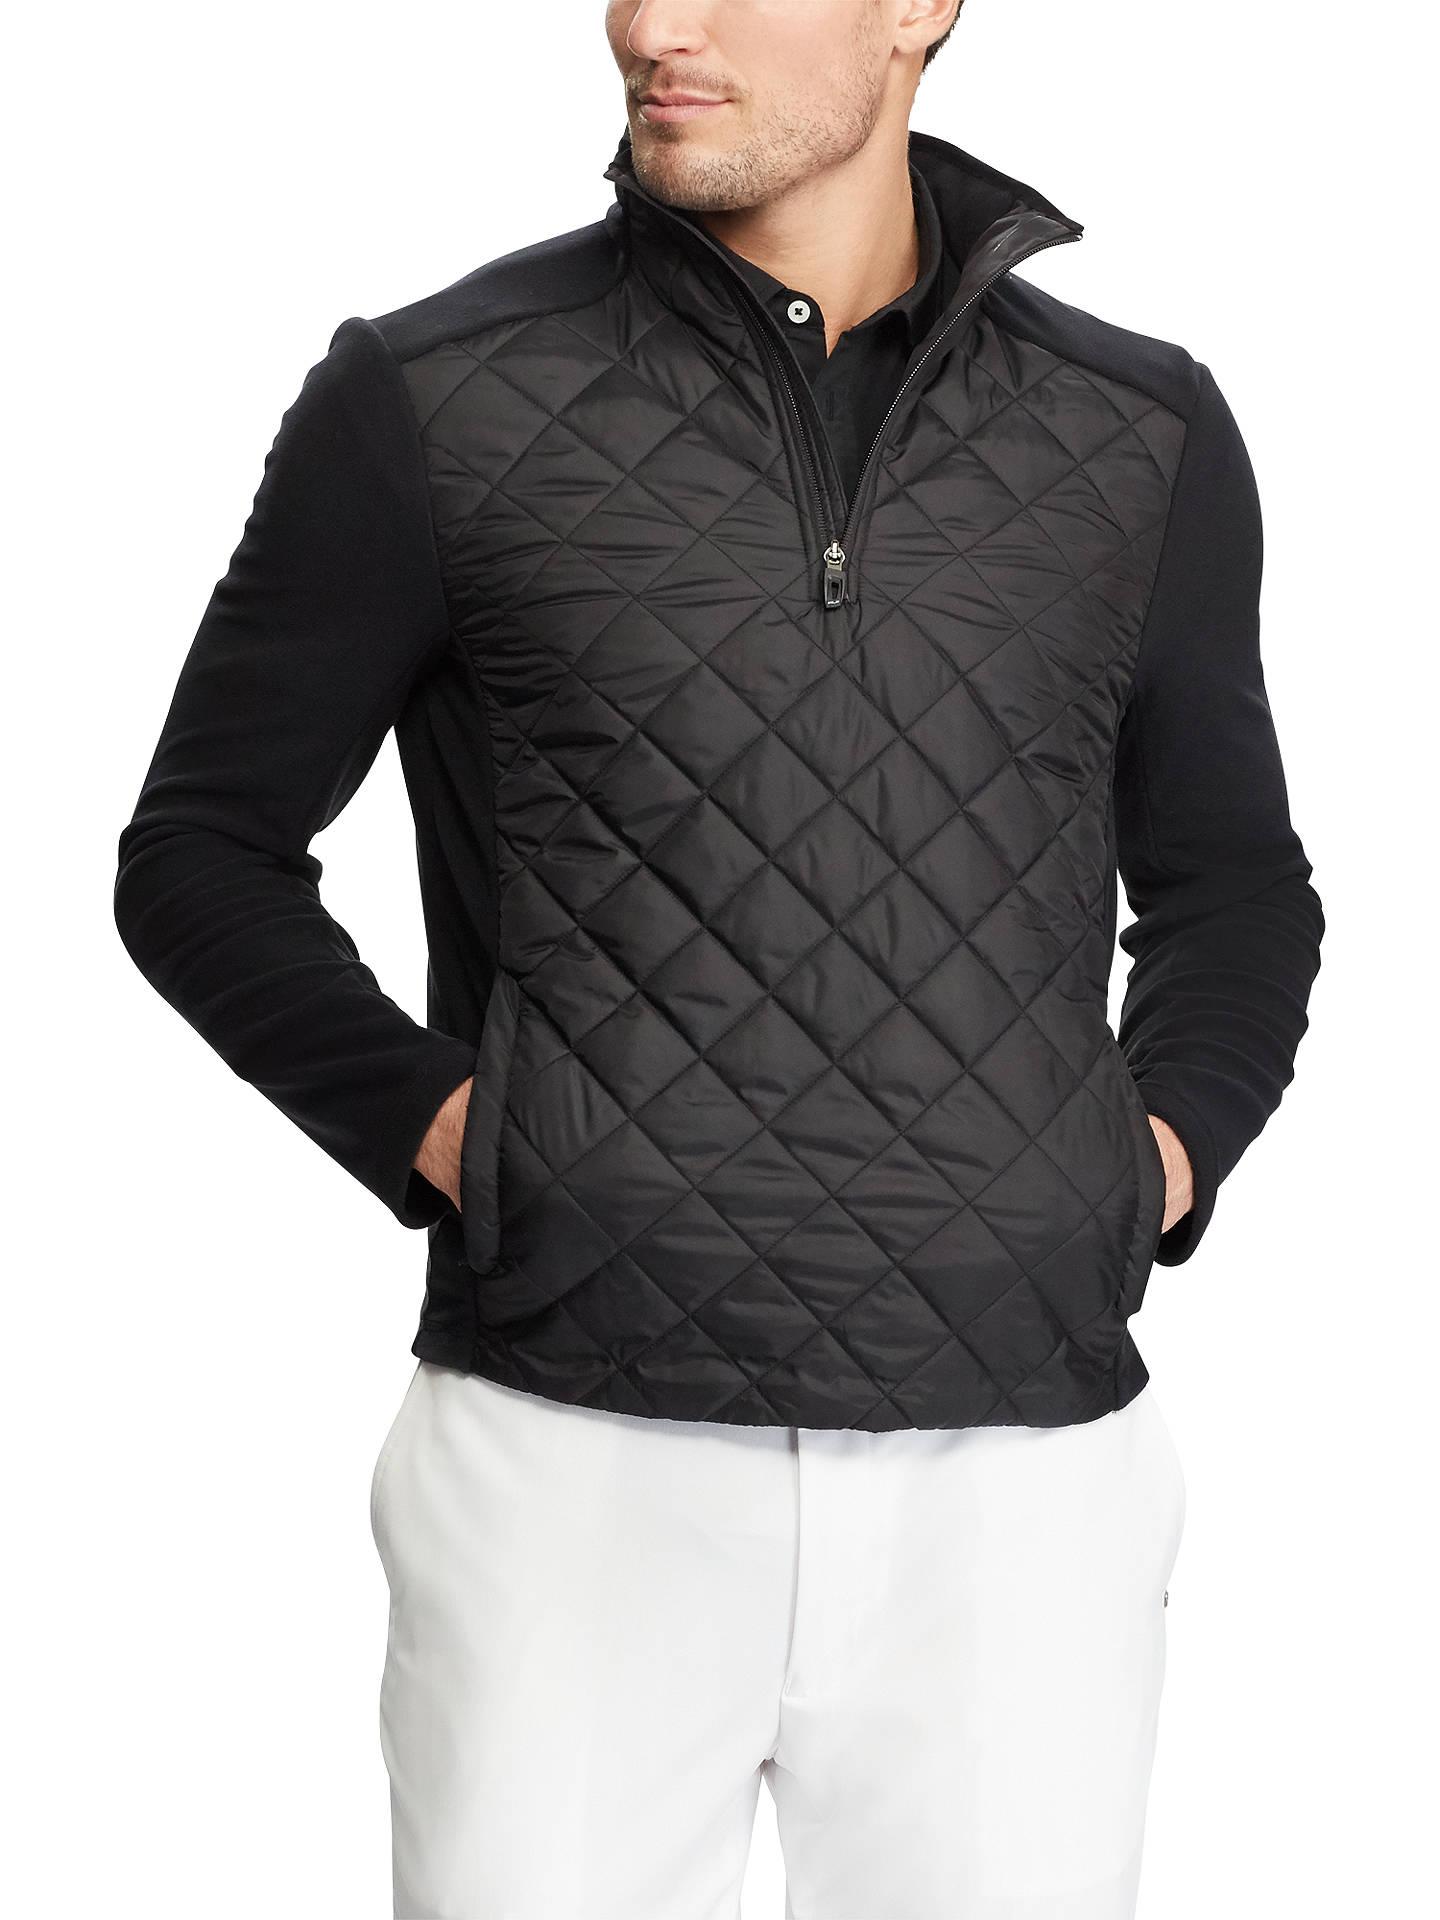 21d3067e Polo Golf By Ralph Lauren Fleece Quilted Jacket, Black at John Lewis ...